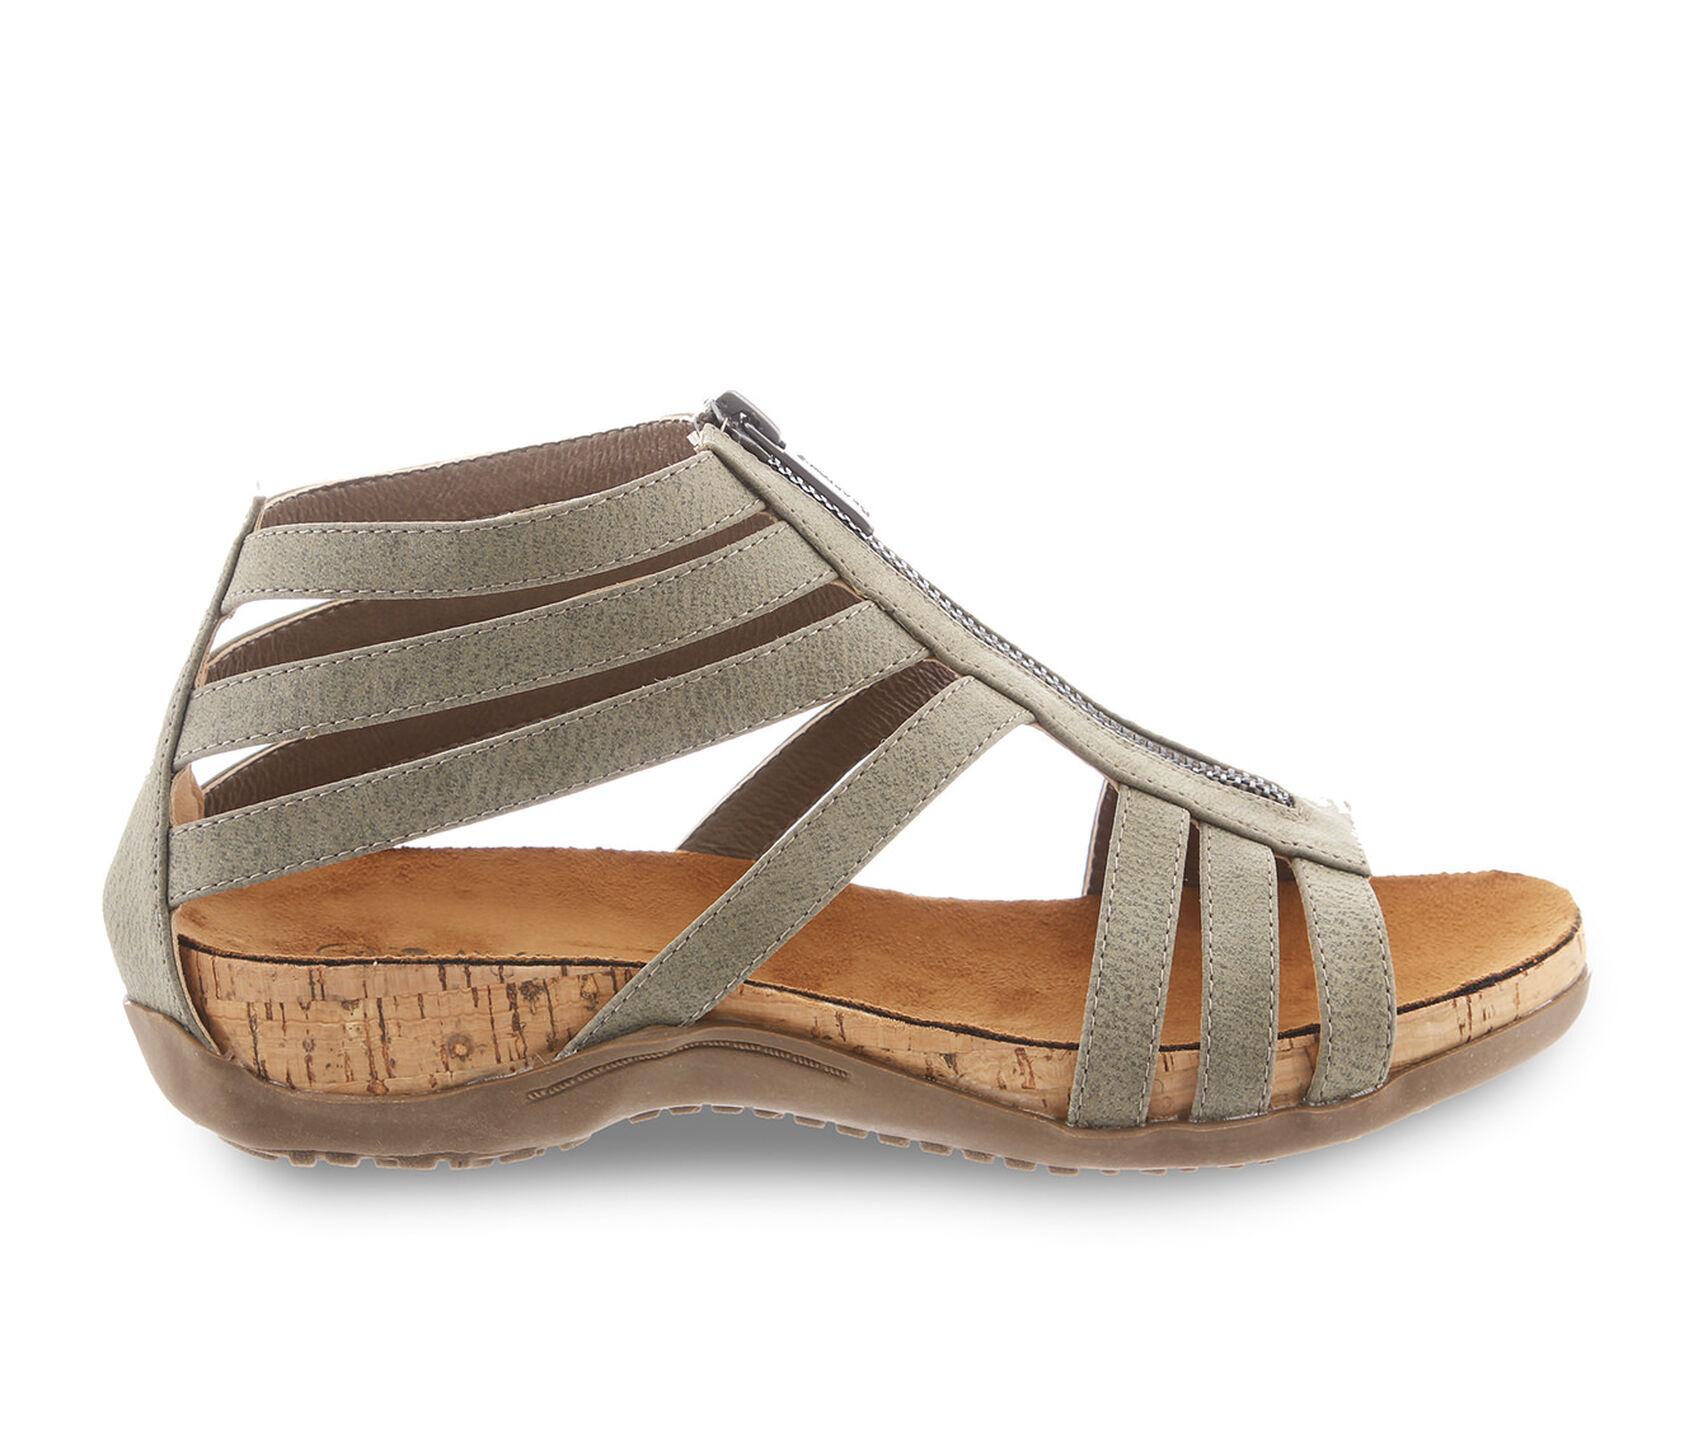 c9bd9adb3cdc Women s Bearpaw Layla Footbed Sandals